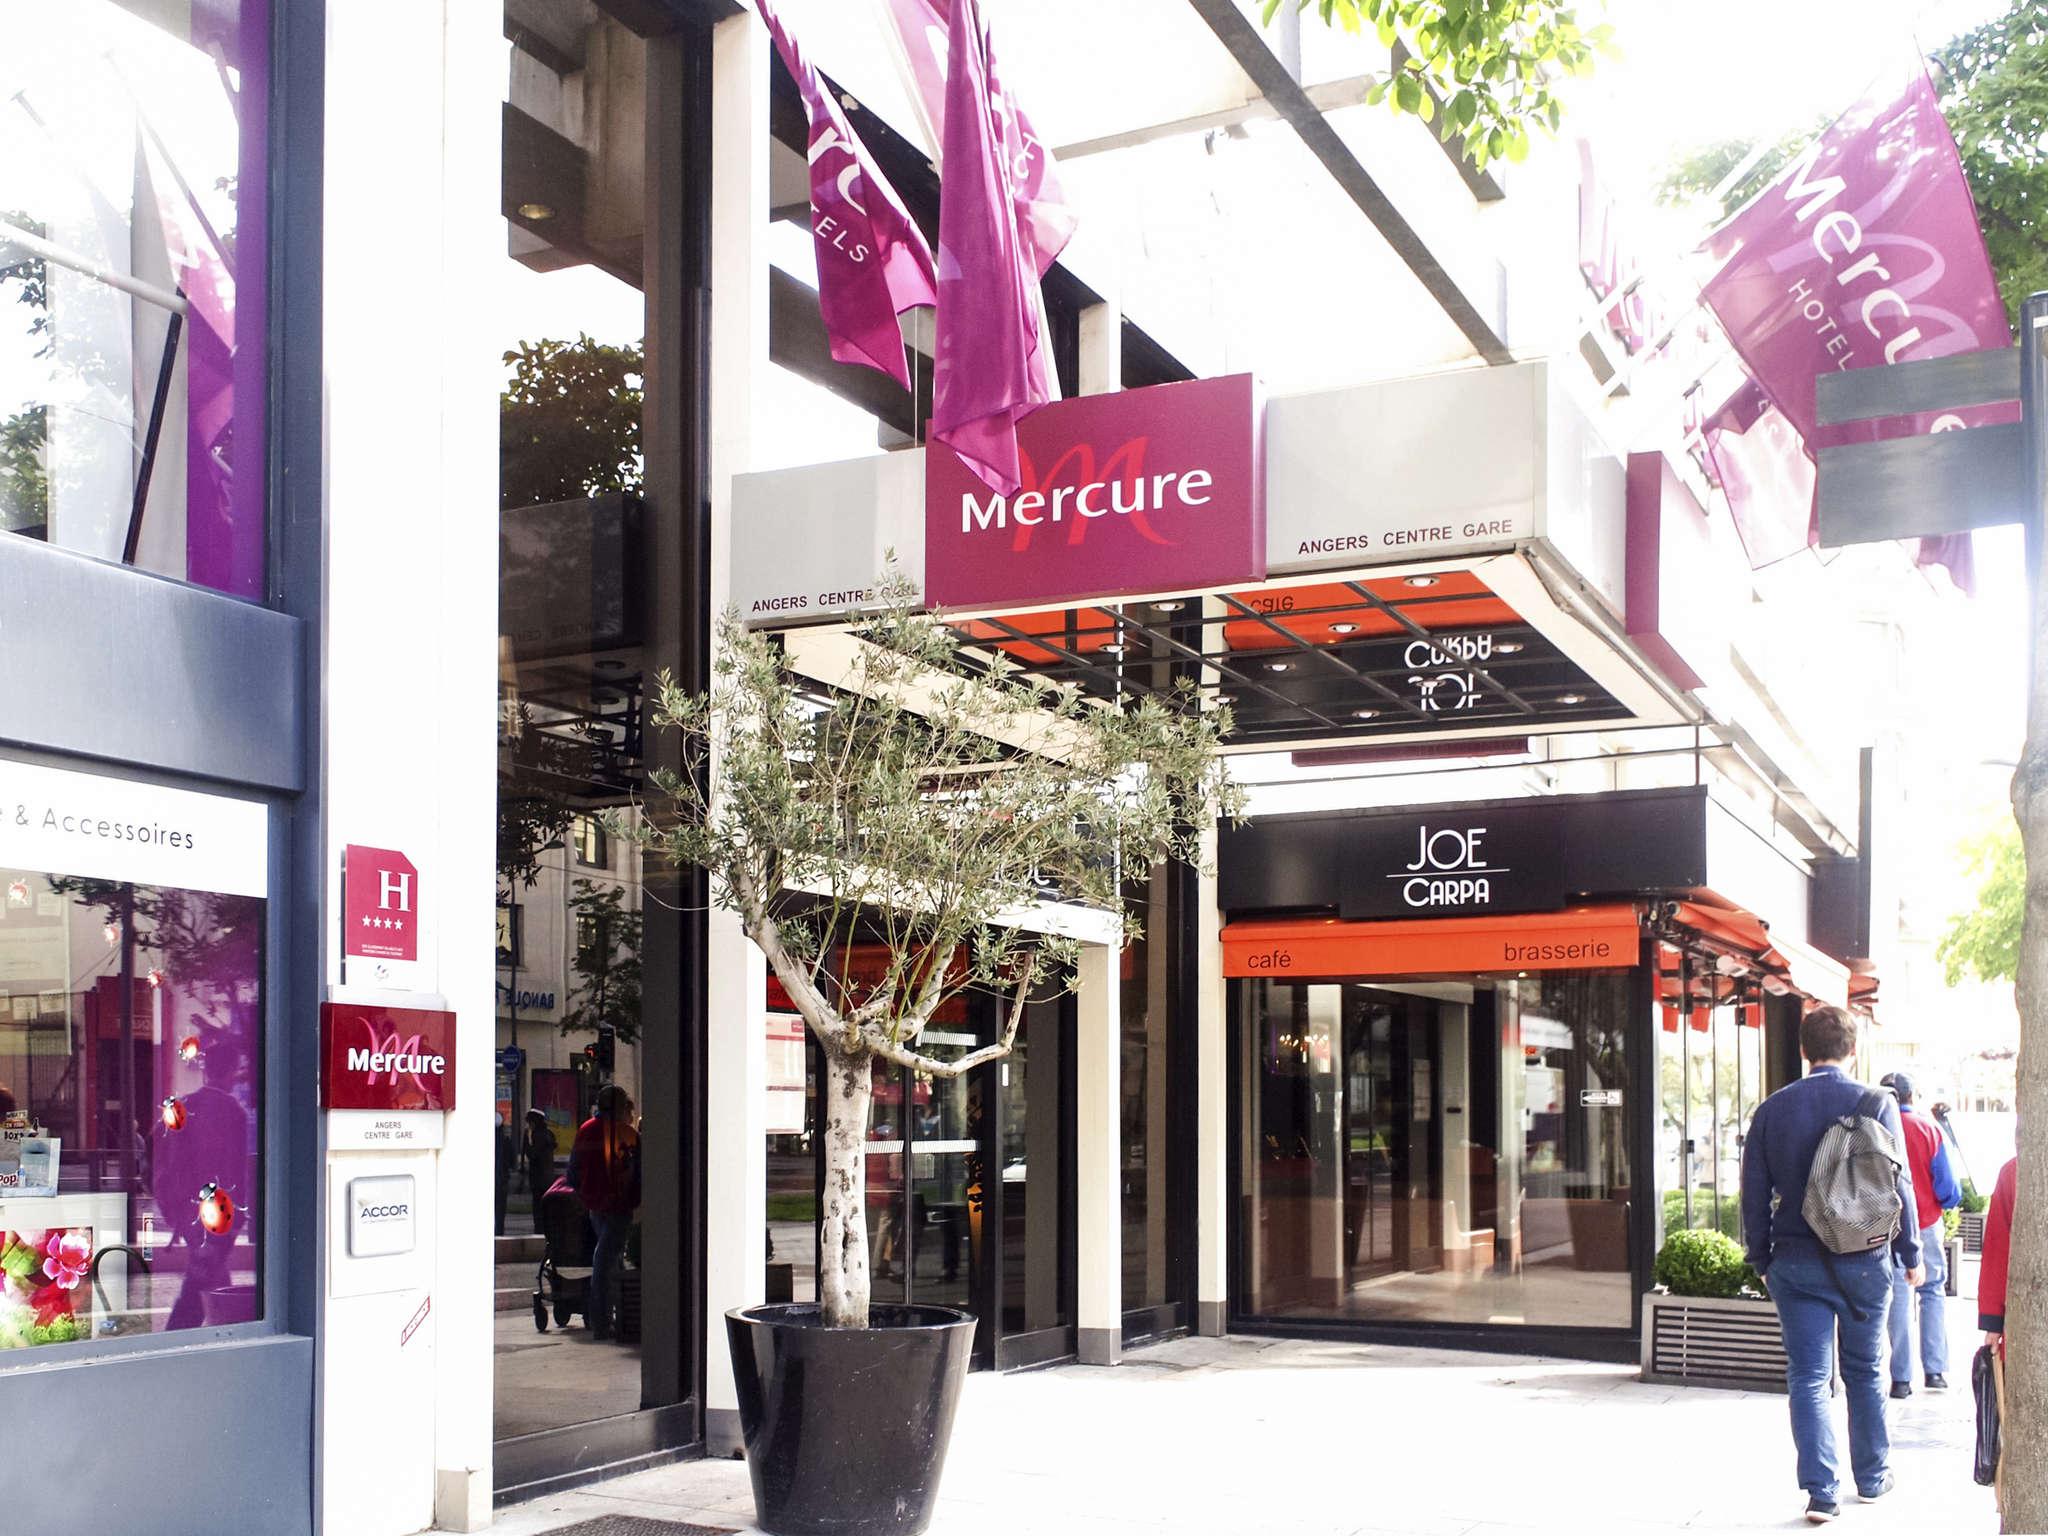 Hotel – Hotel Mercure Angers Centre Gare